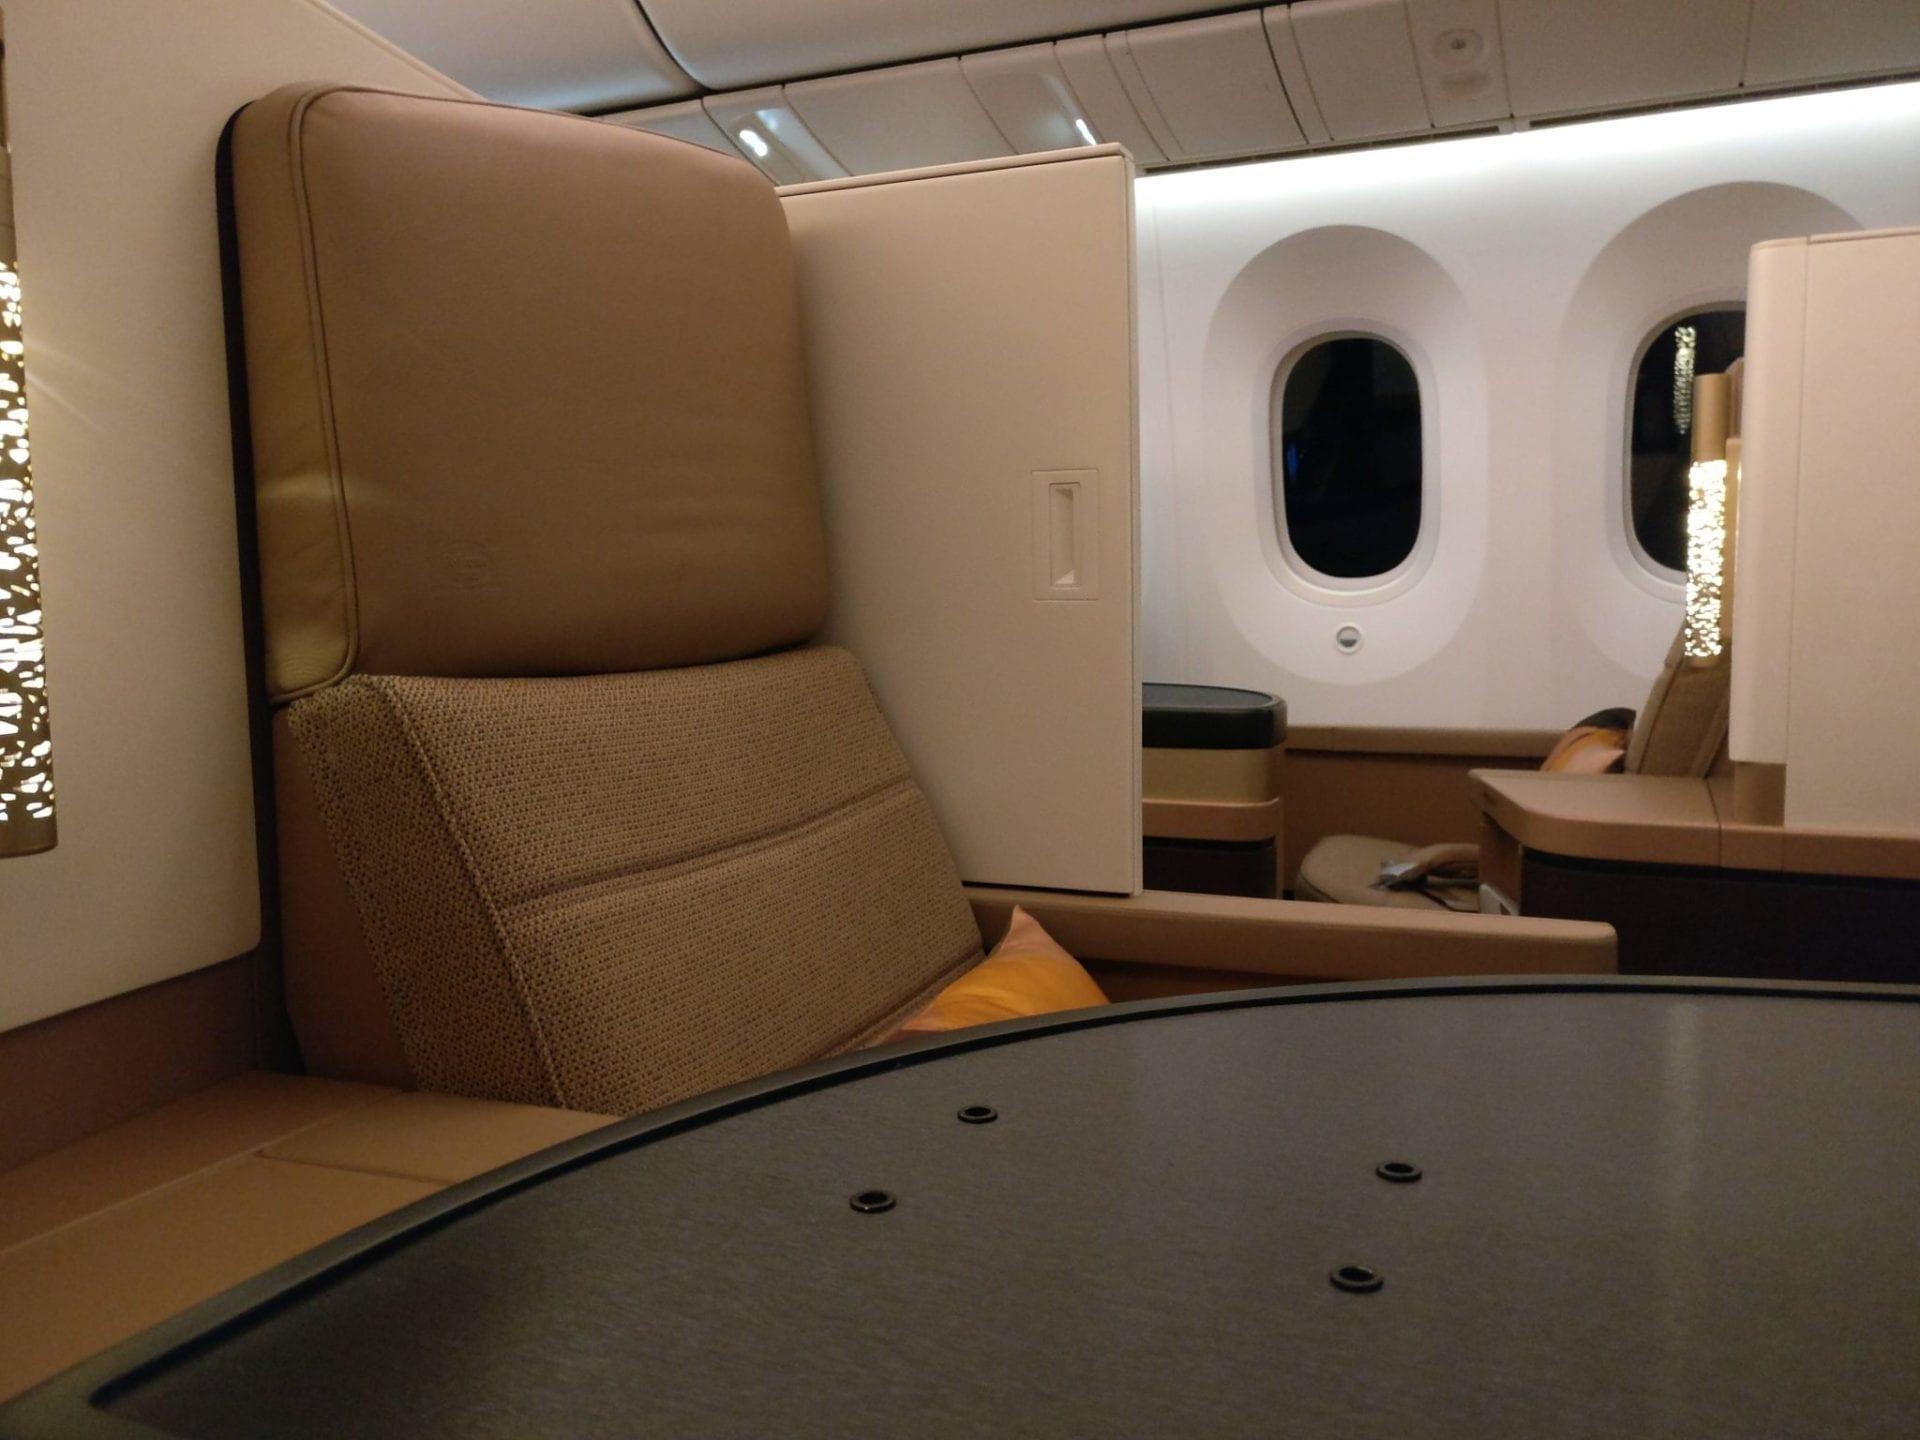 etihad-airways-boeing-787-business-class-seat-8